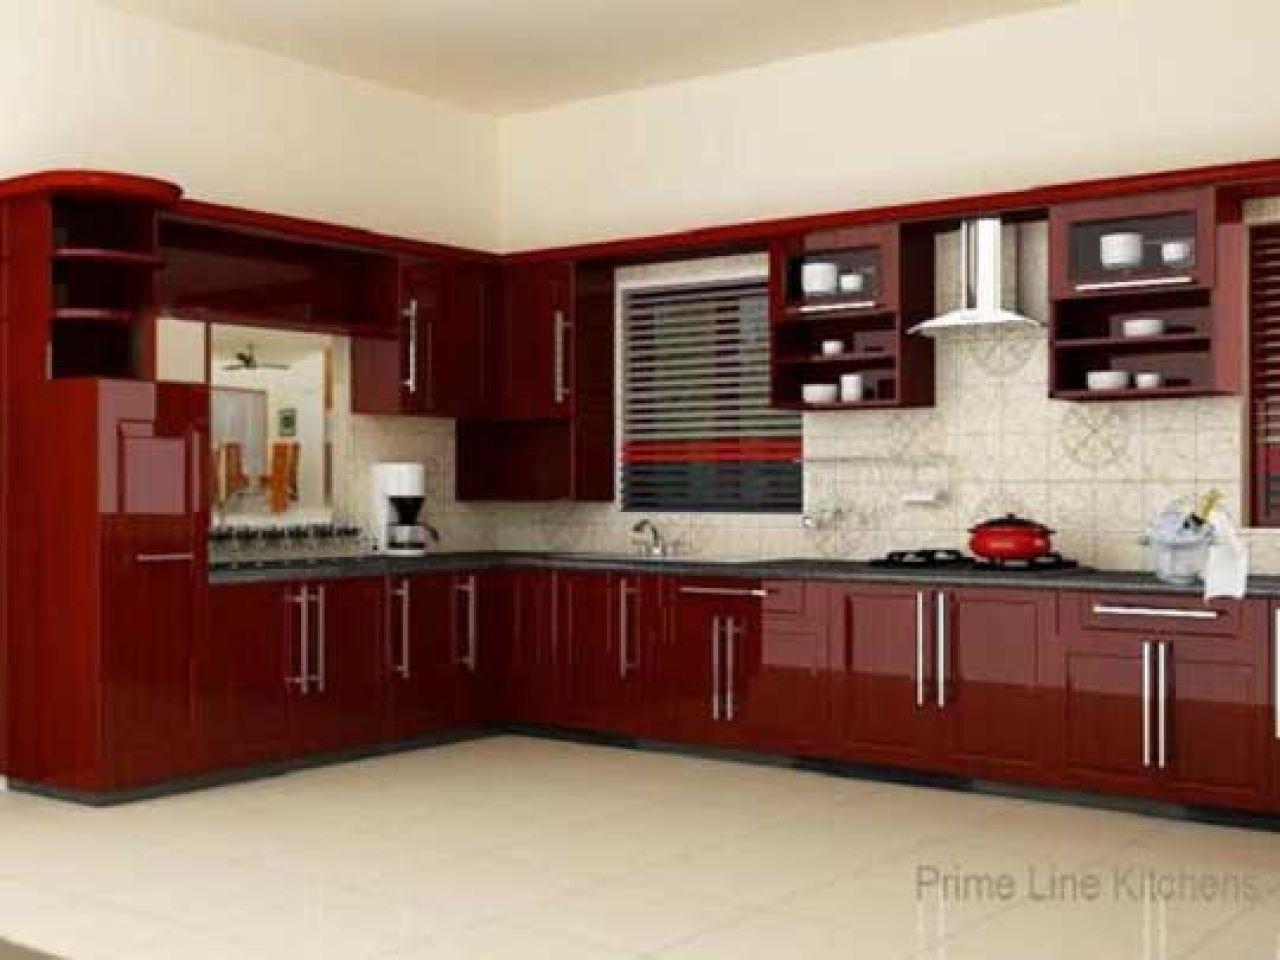 New Model Kitchen Design Kerala conexaowebmix.com ... on Model Kitchen Ideas  id=23759